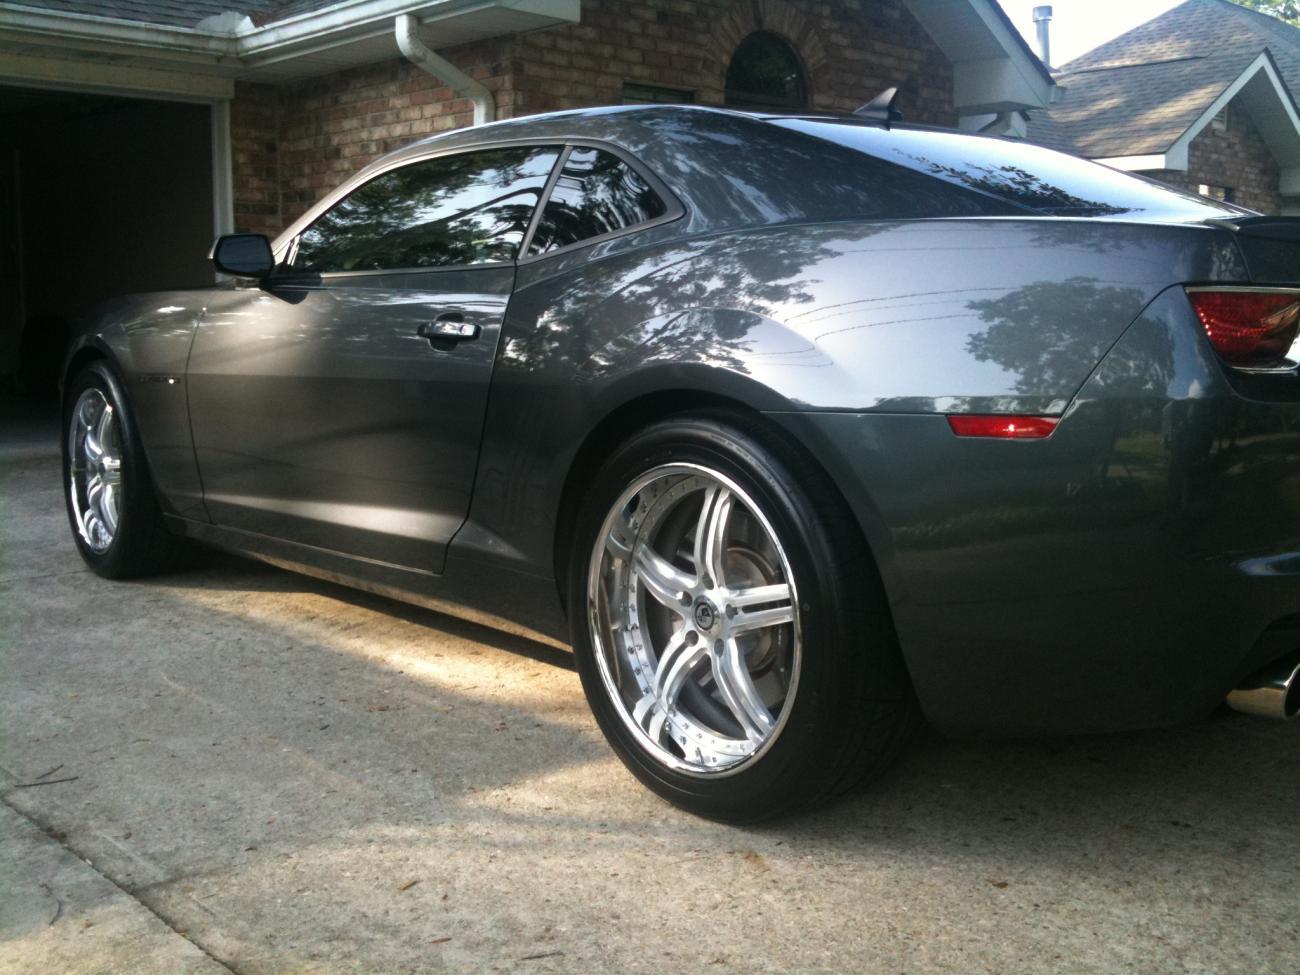 custom 2010 camaro rs ss wheels tires for sale camaro5. Black Bedroom Furniture Sets. Home Design Ideas